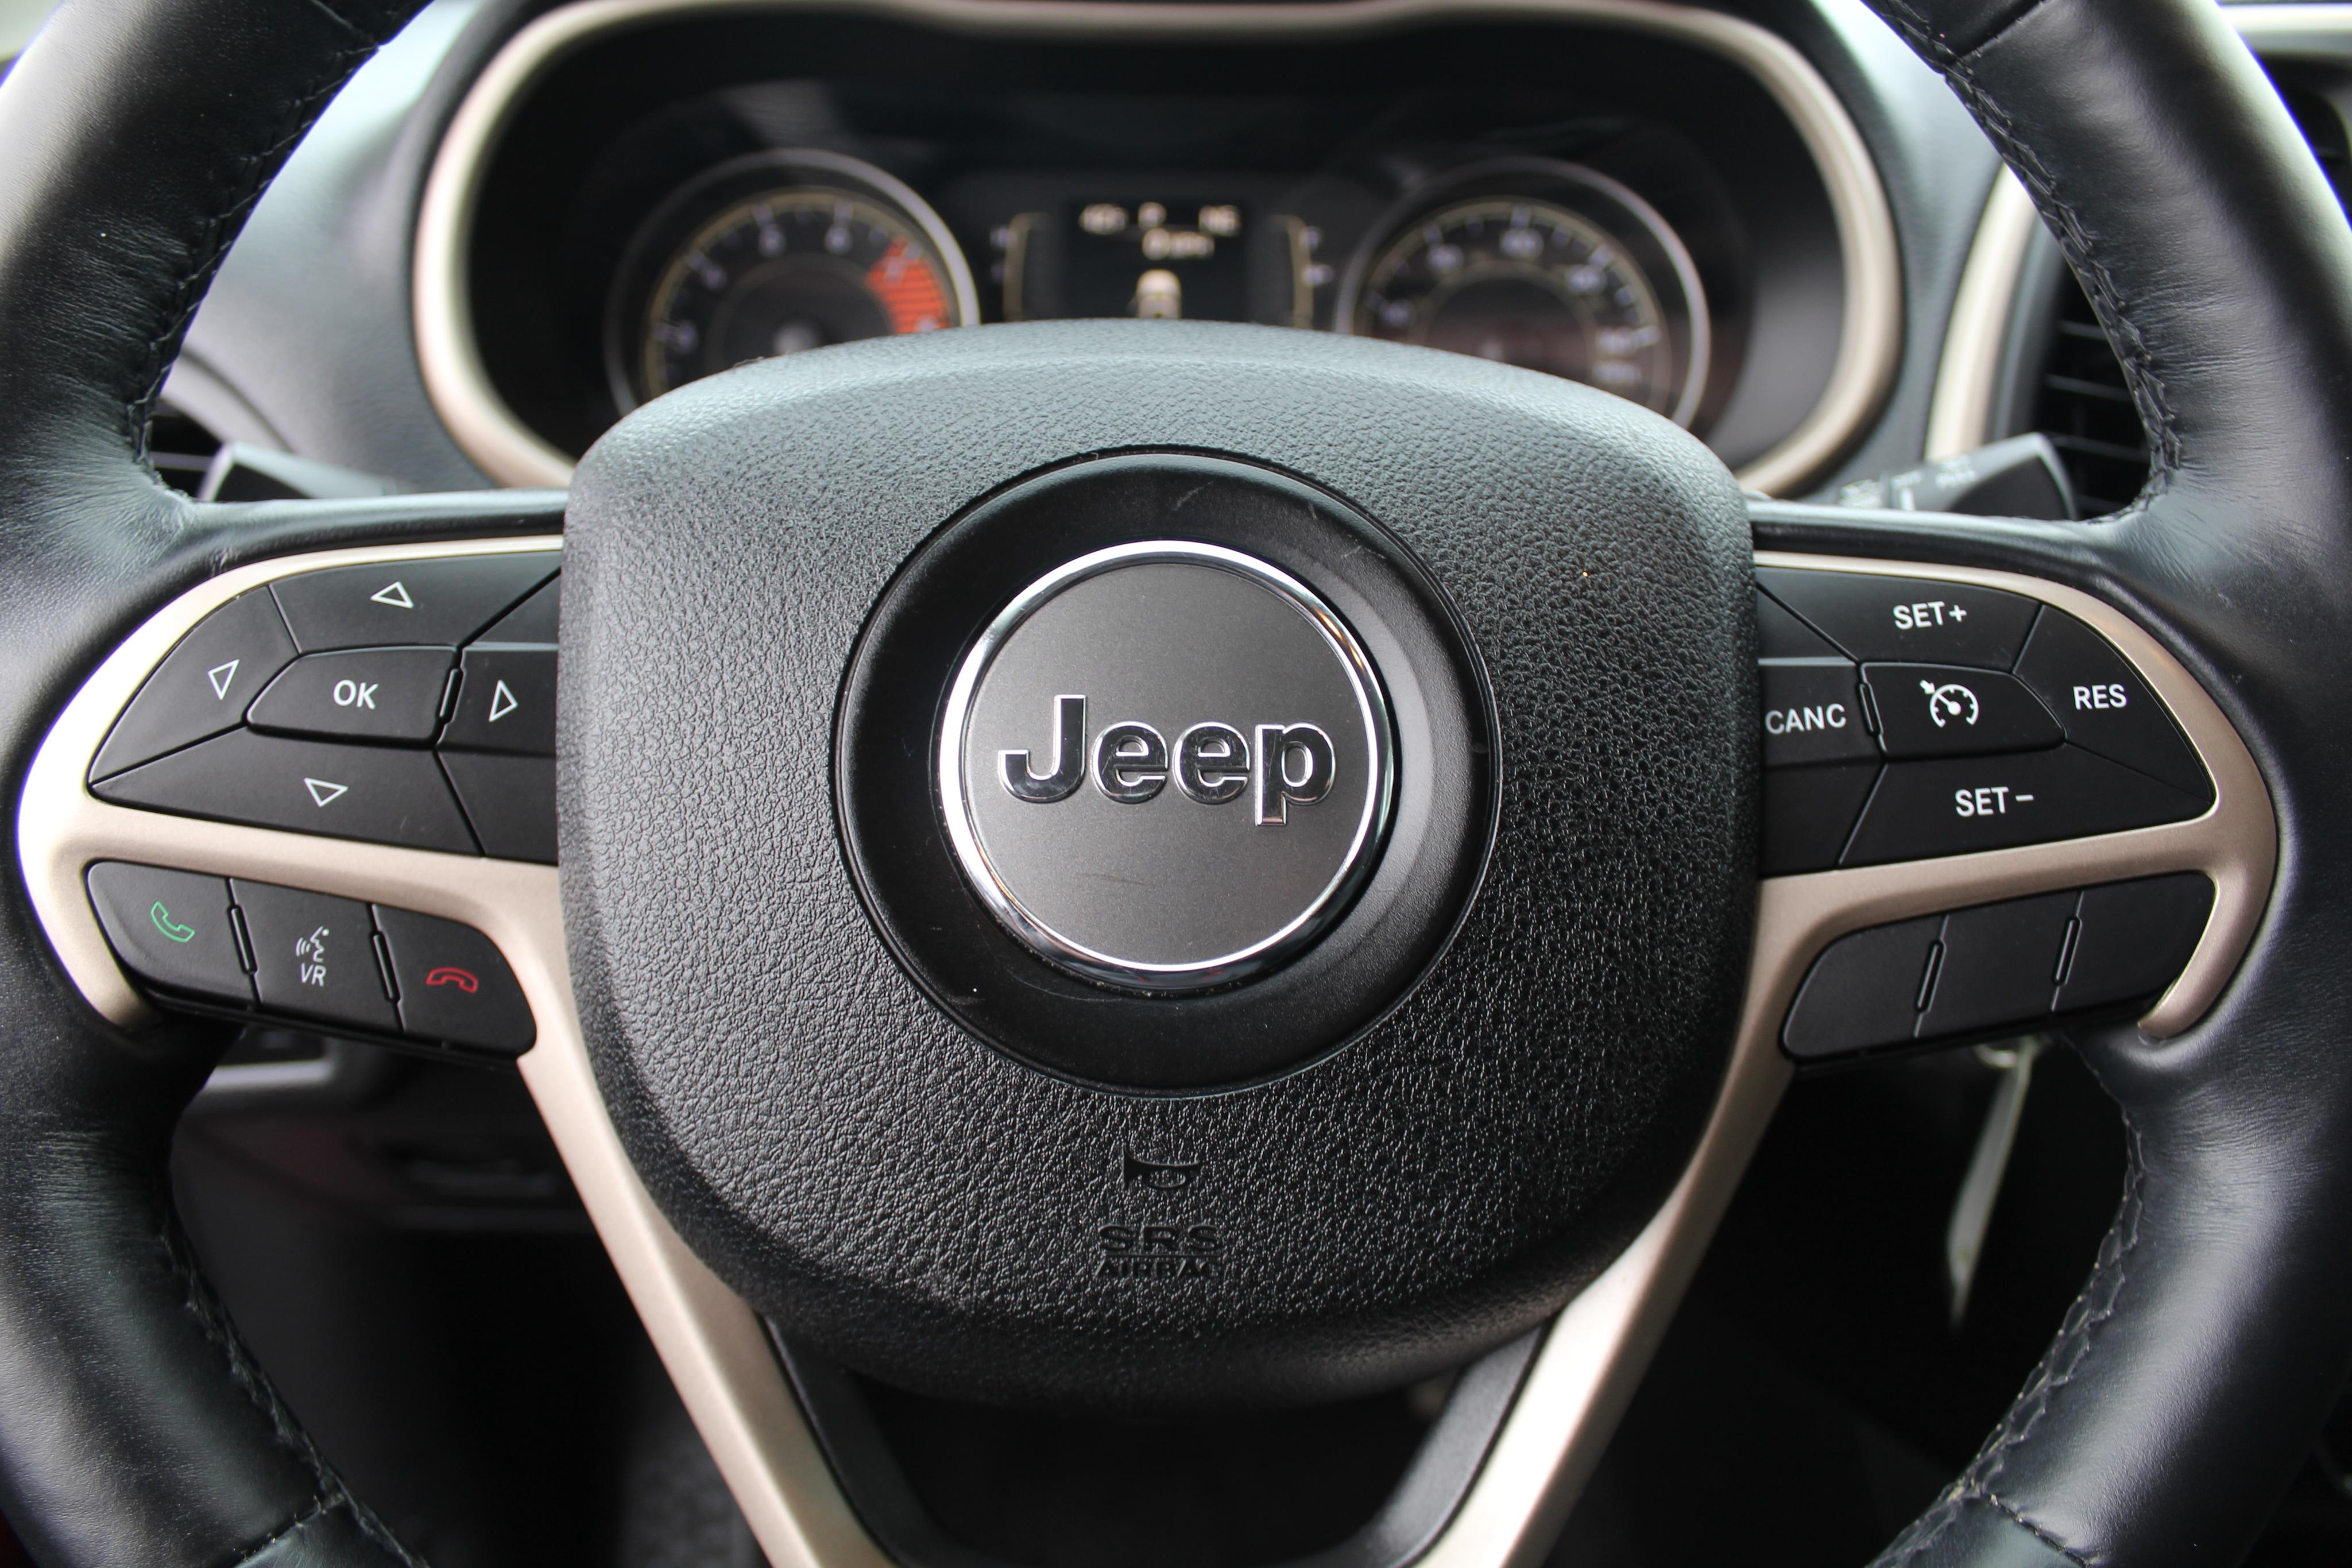 2017 Jeep Cherokee Wagon 4 Dr.